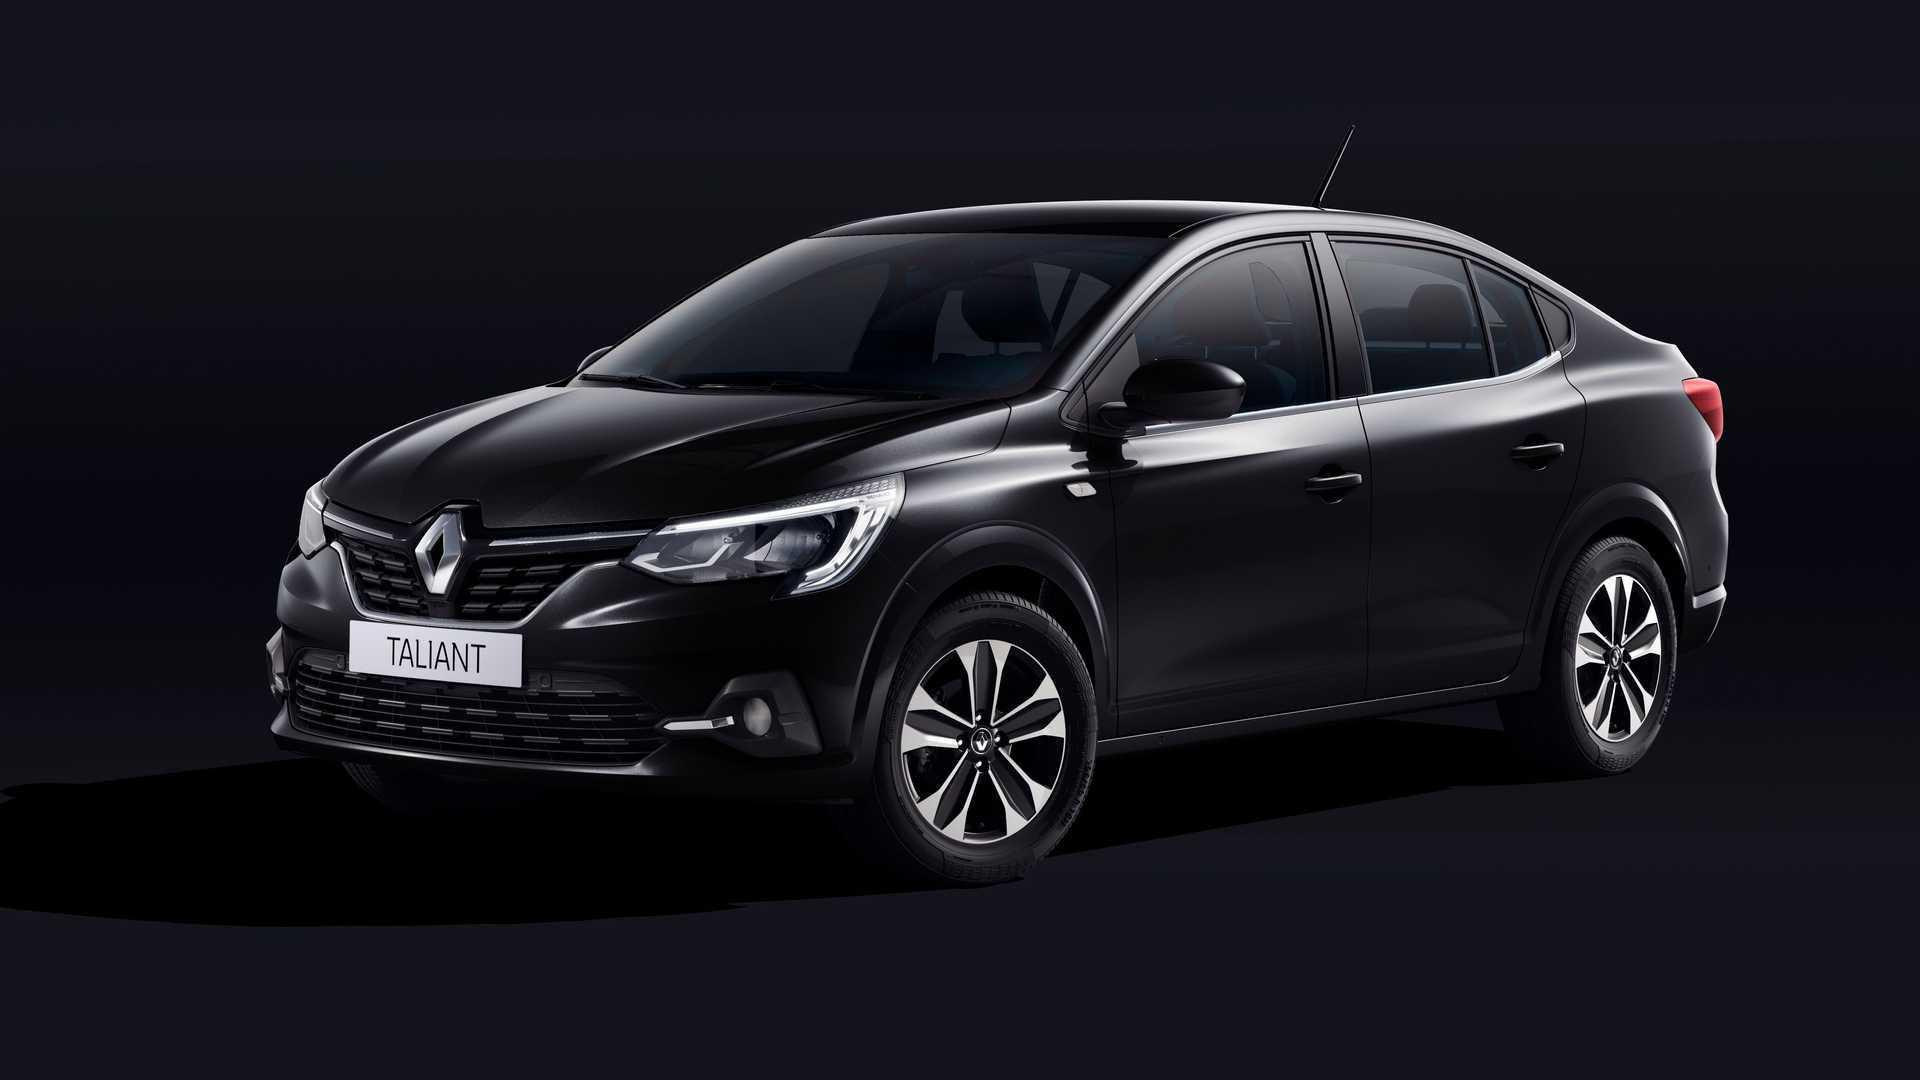 2021_Renault_Taliant-0002